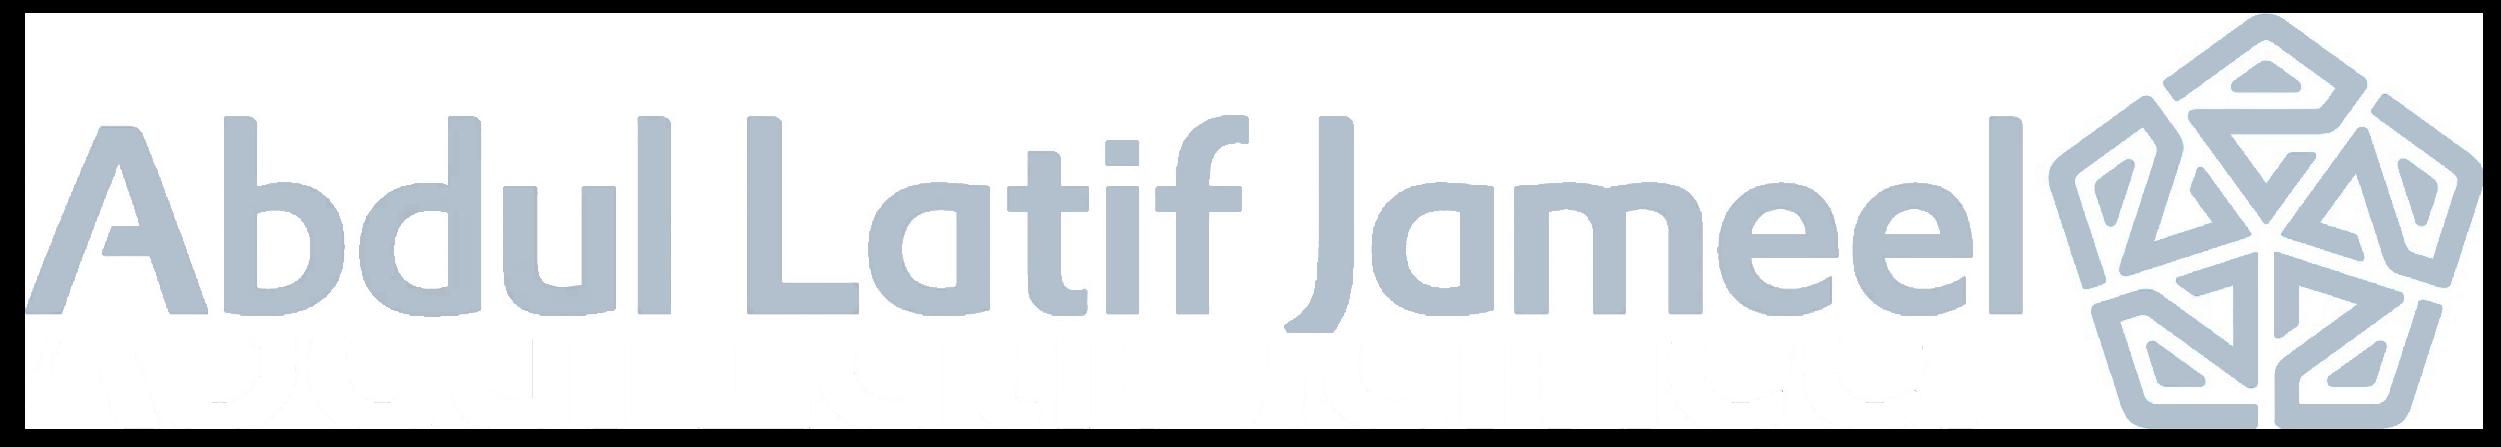 Abdul Latif Jameel grey logo